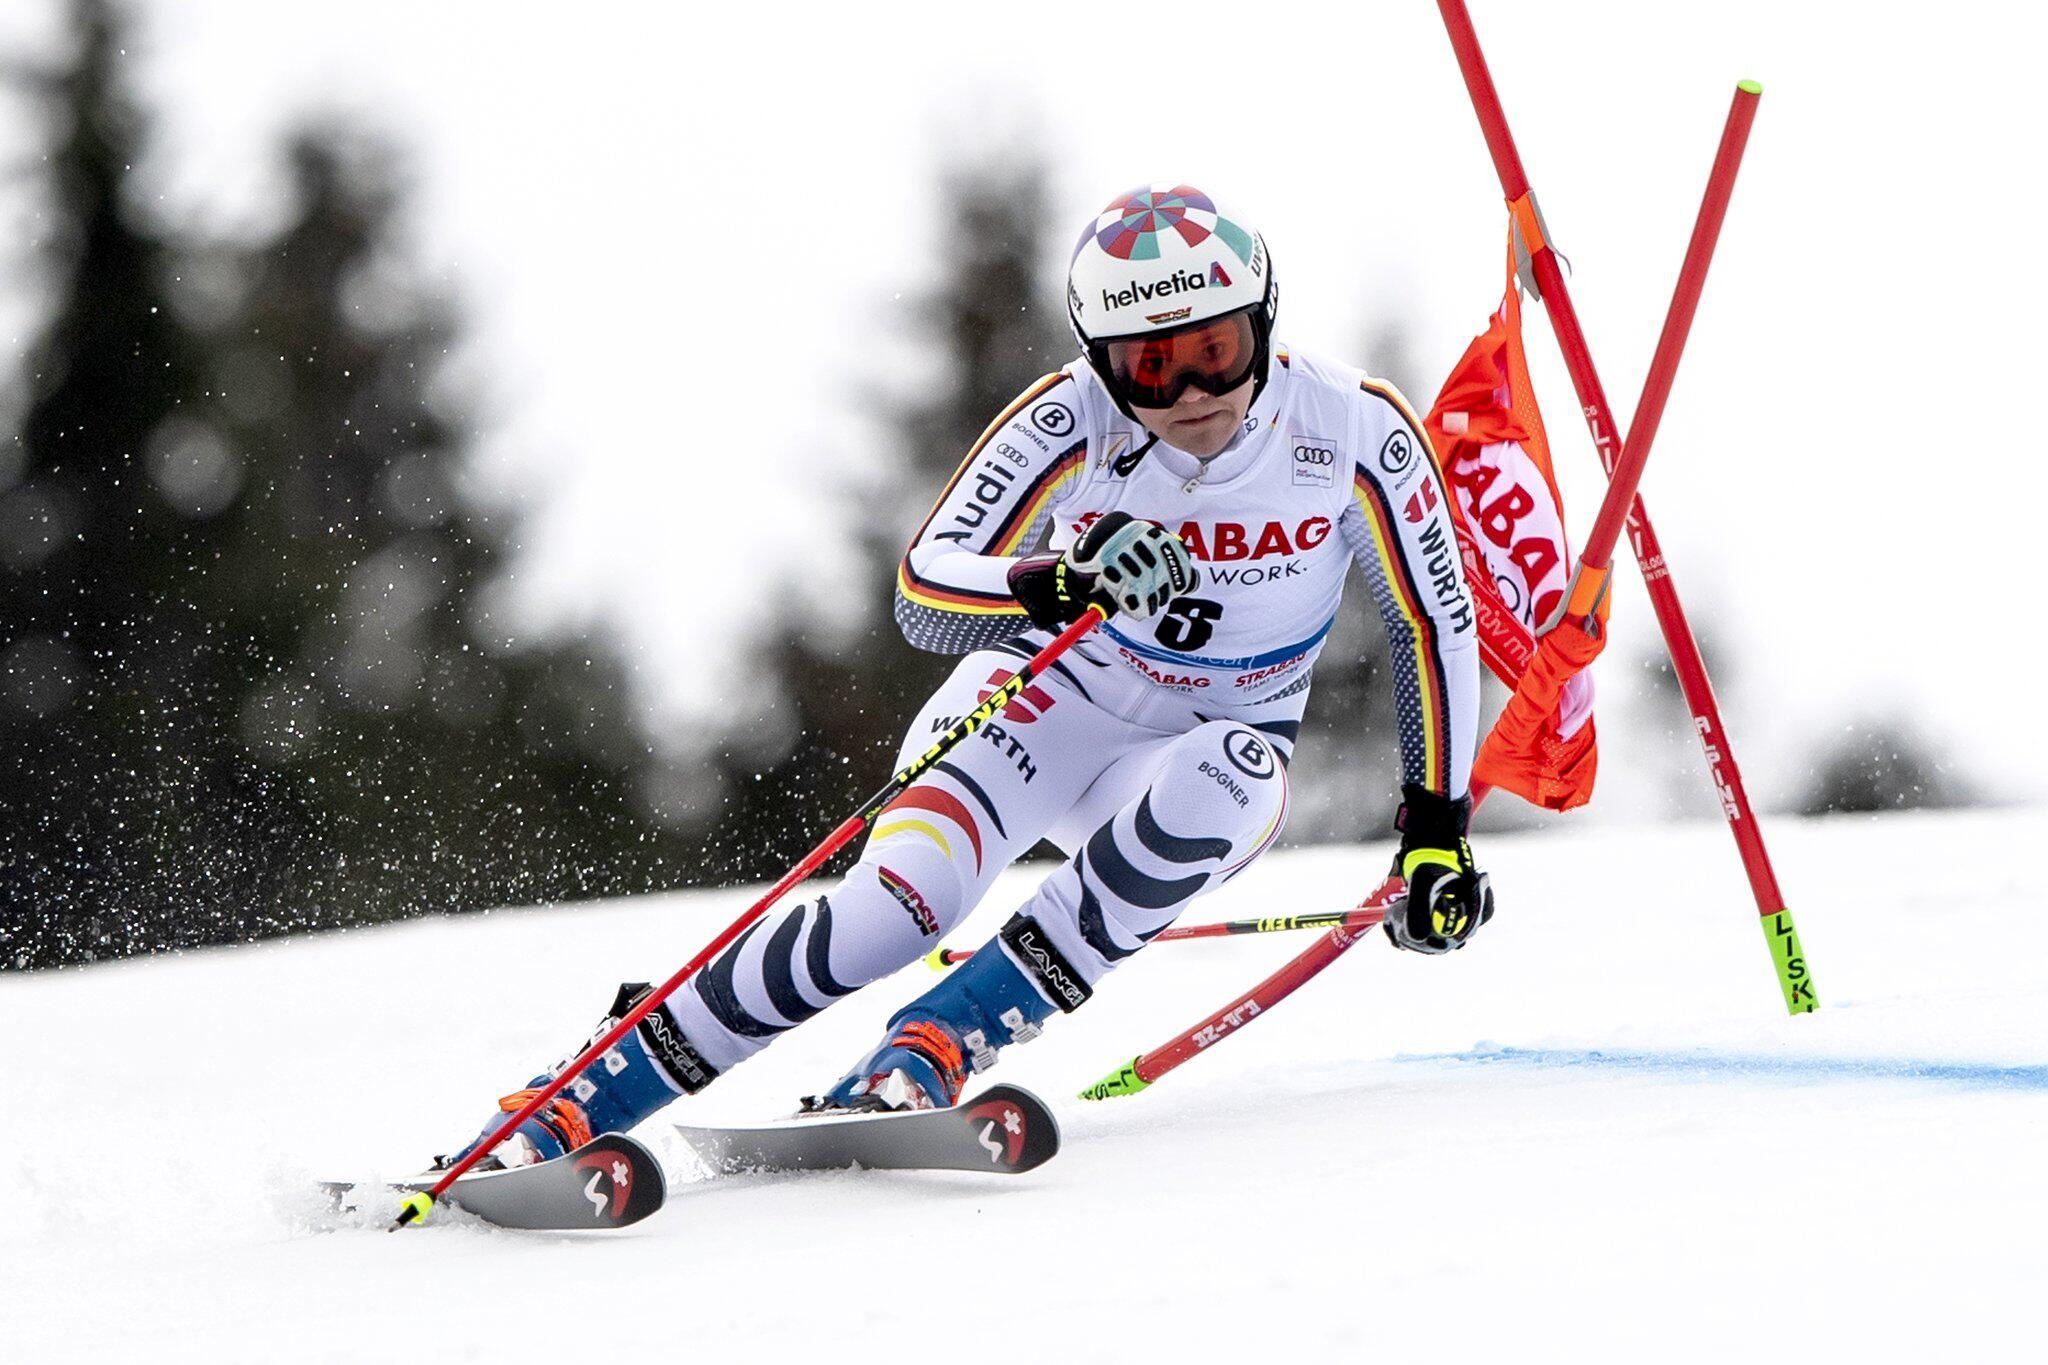 Bild zu Viktoria Rebensburg, Ski alpin, Ski, Weltcup, Spindlermühle, Riesenslalom